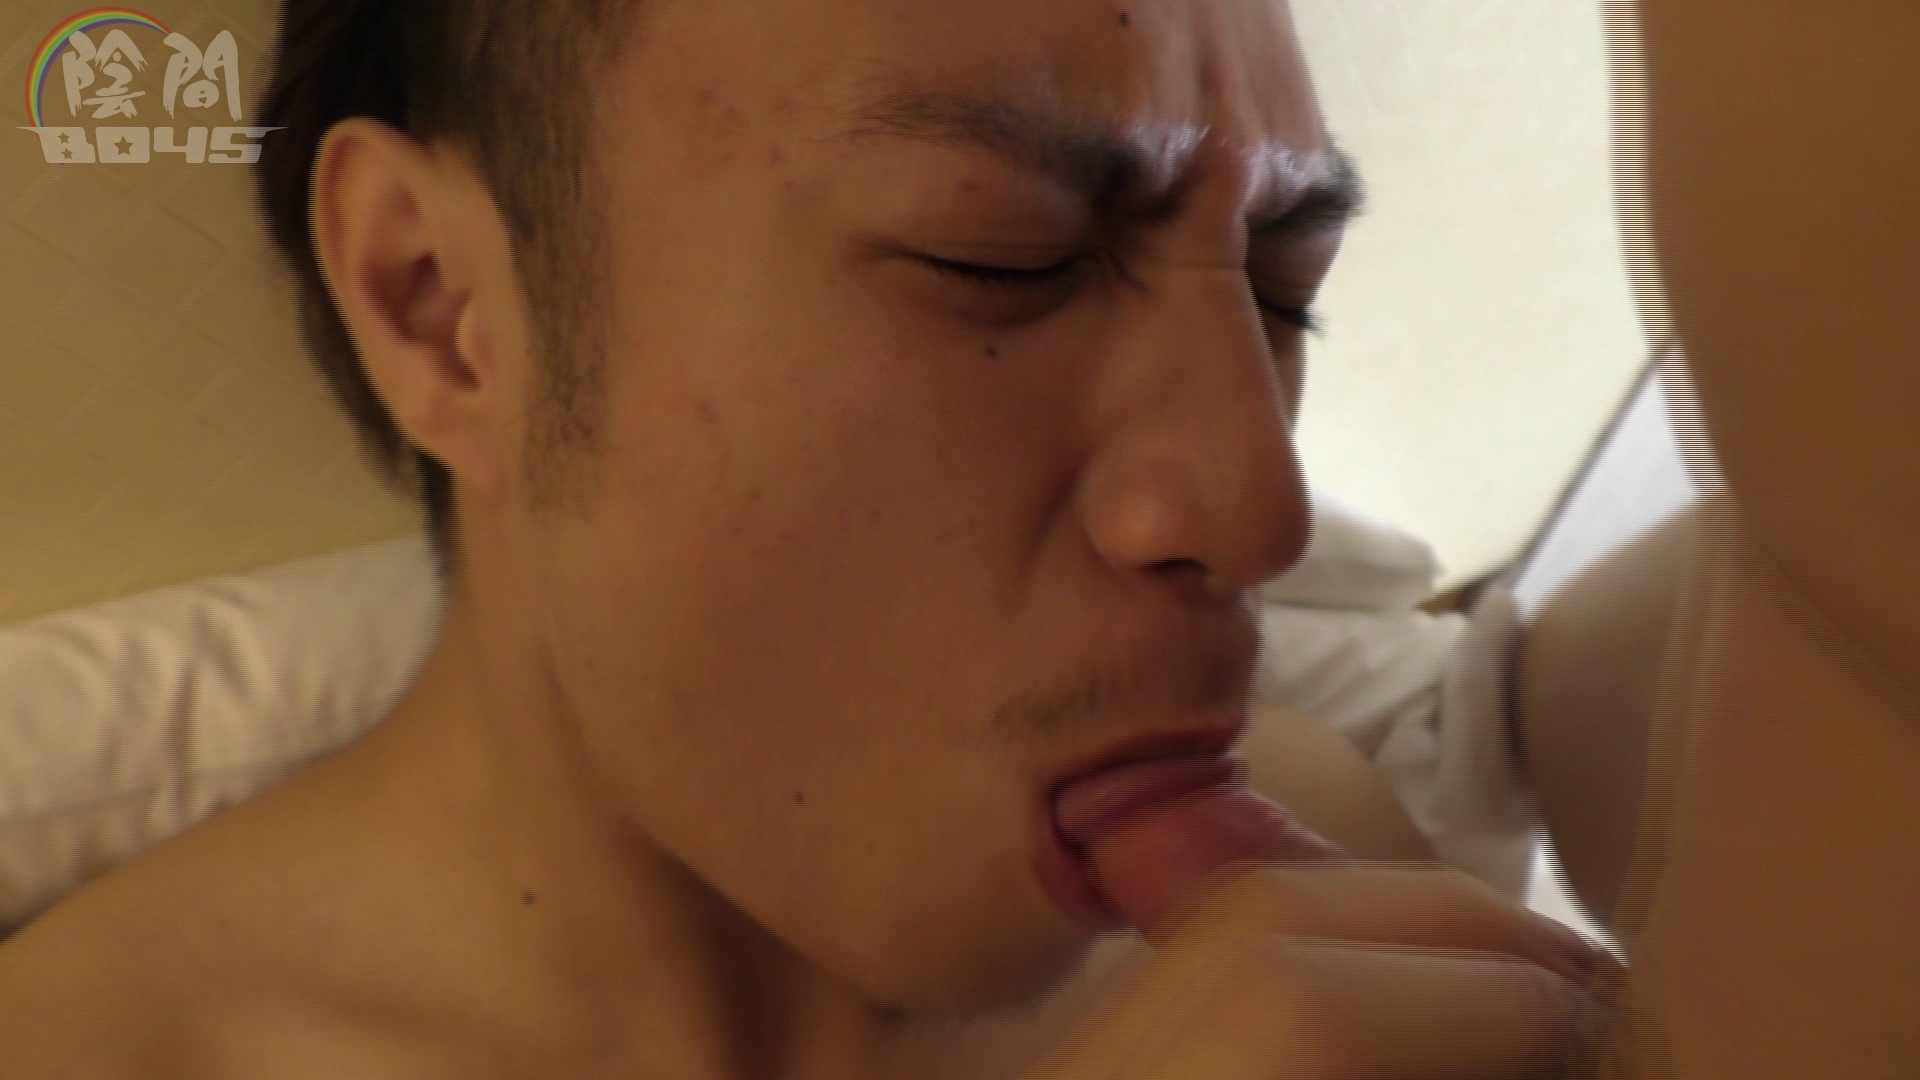 "ADのお仕事part4 No.03""中出しだけは勘弁"" 男のゲイ天国  11枚 6"